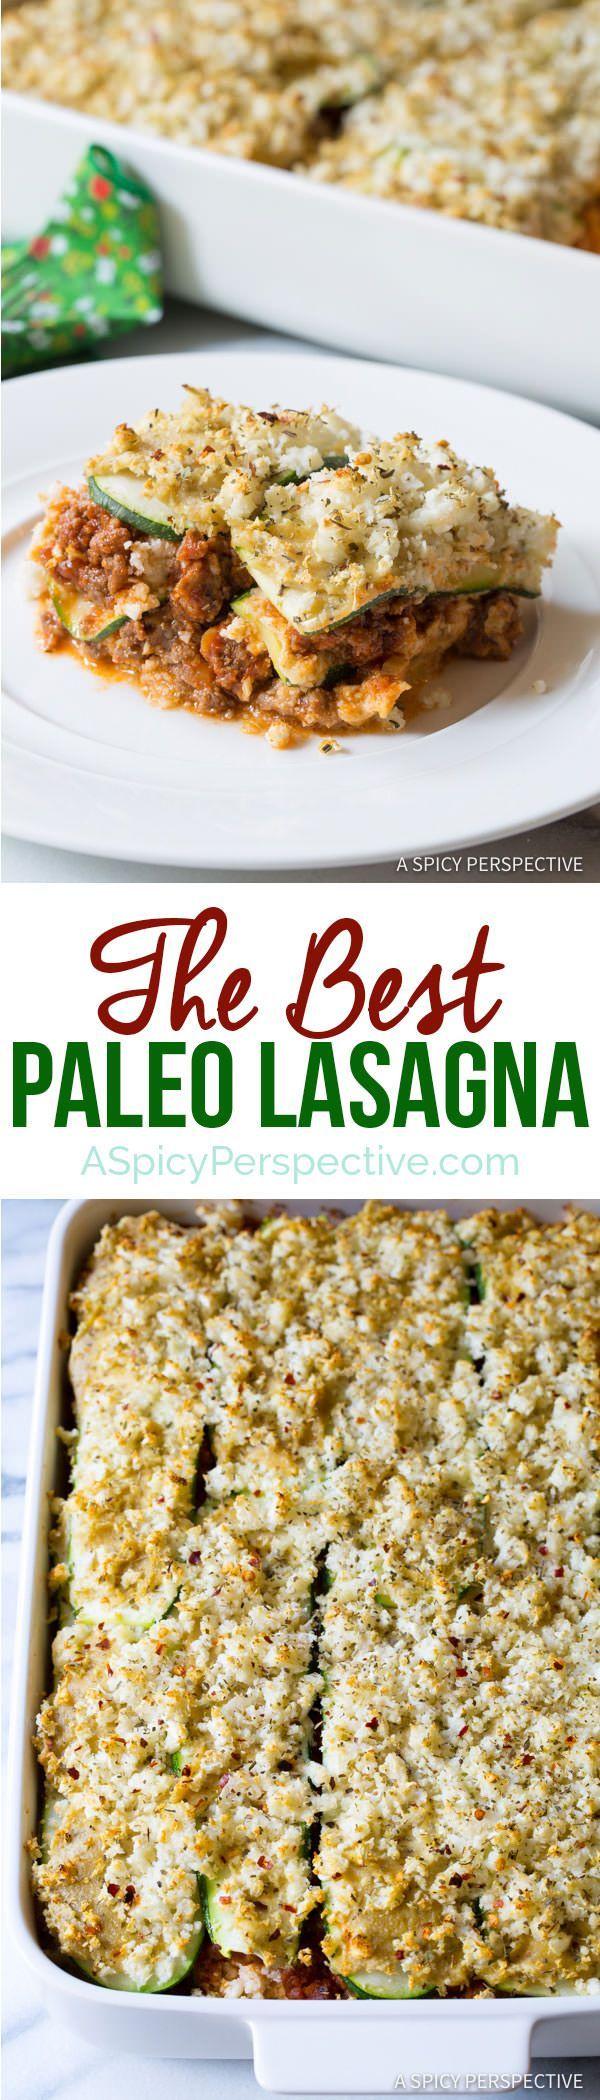 The Best Paleo Lasagna Recipe | http://ASpicyPerspective.com